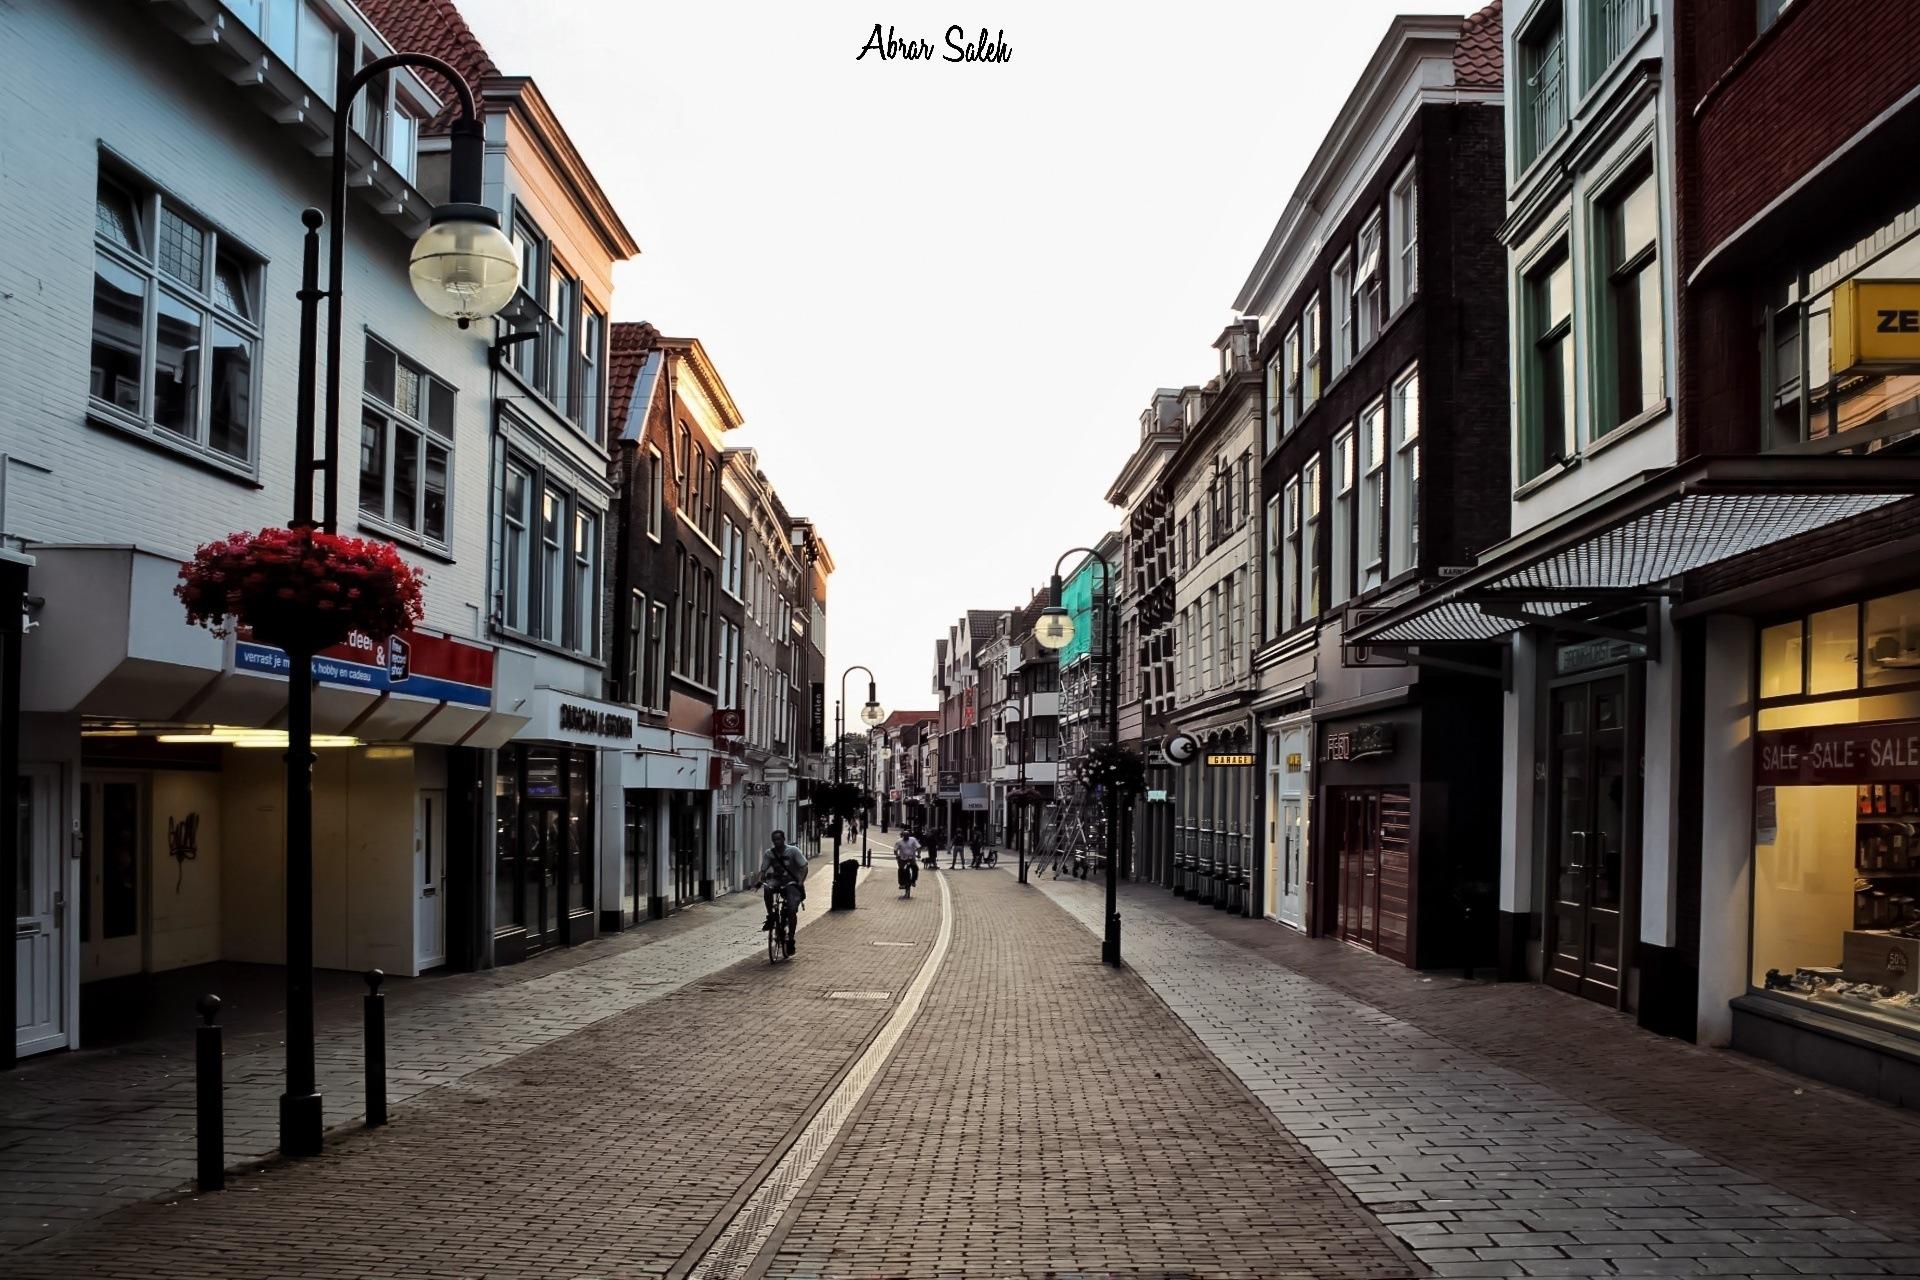 City_old streets / Gorinchem_Netherlands / Canon_1300D / 18-55mm by Abrar Saleh